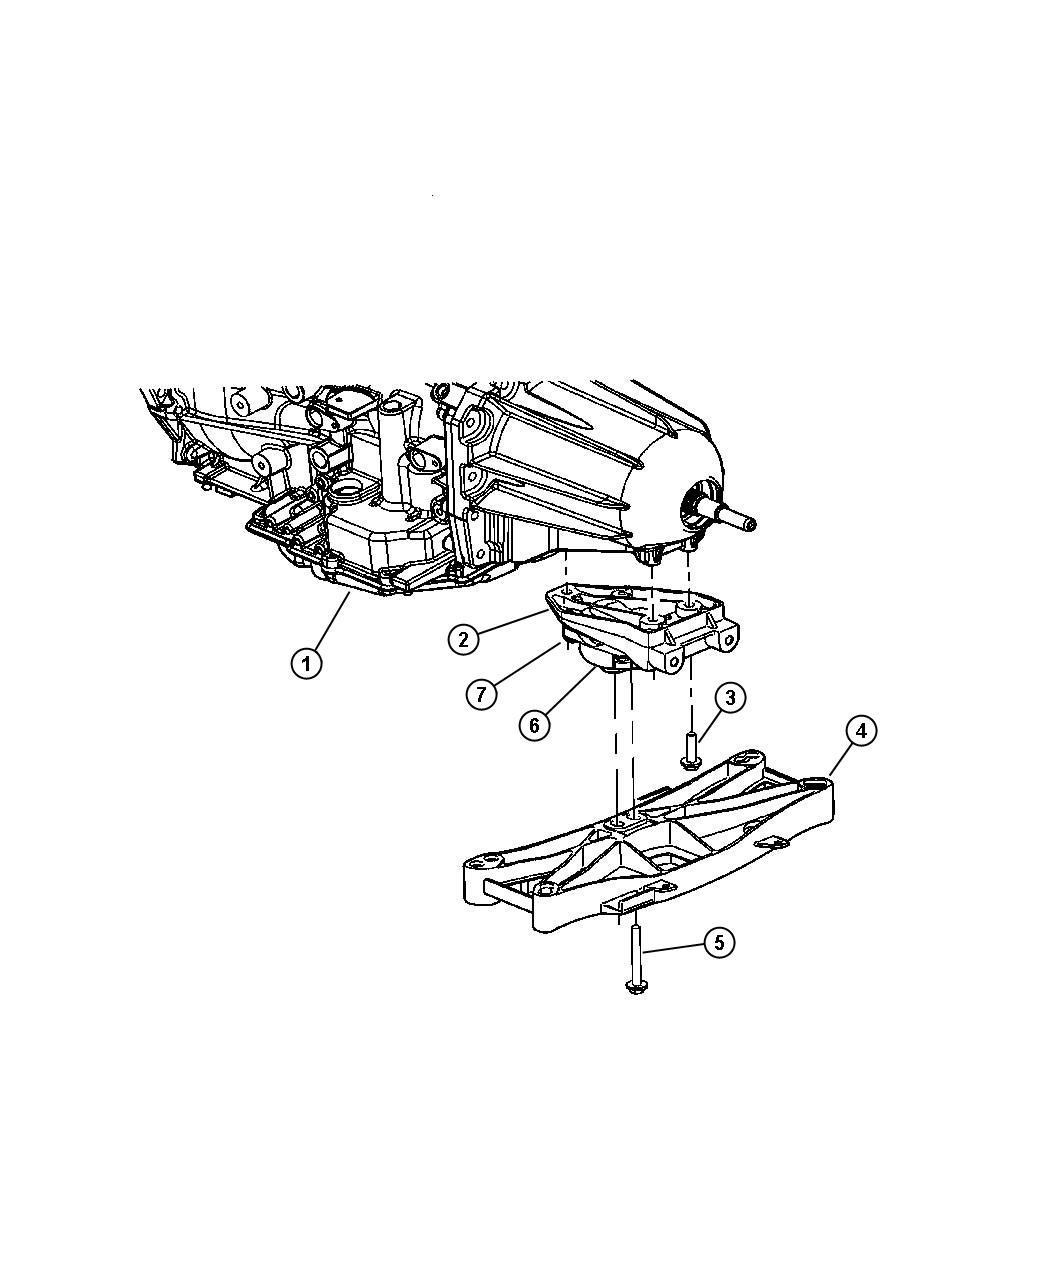 Chrysler 300 Crossmember Transmission Engine Mount